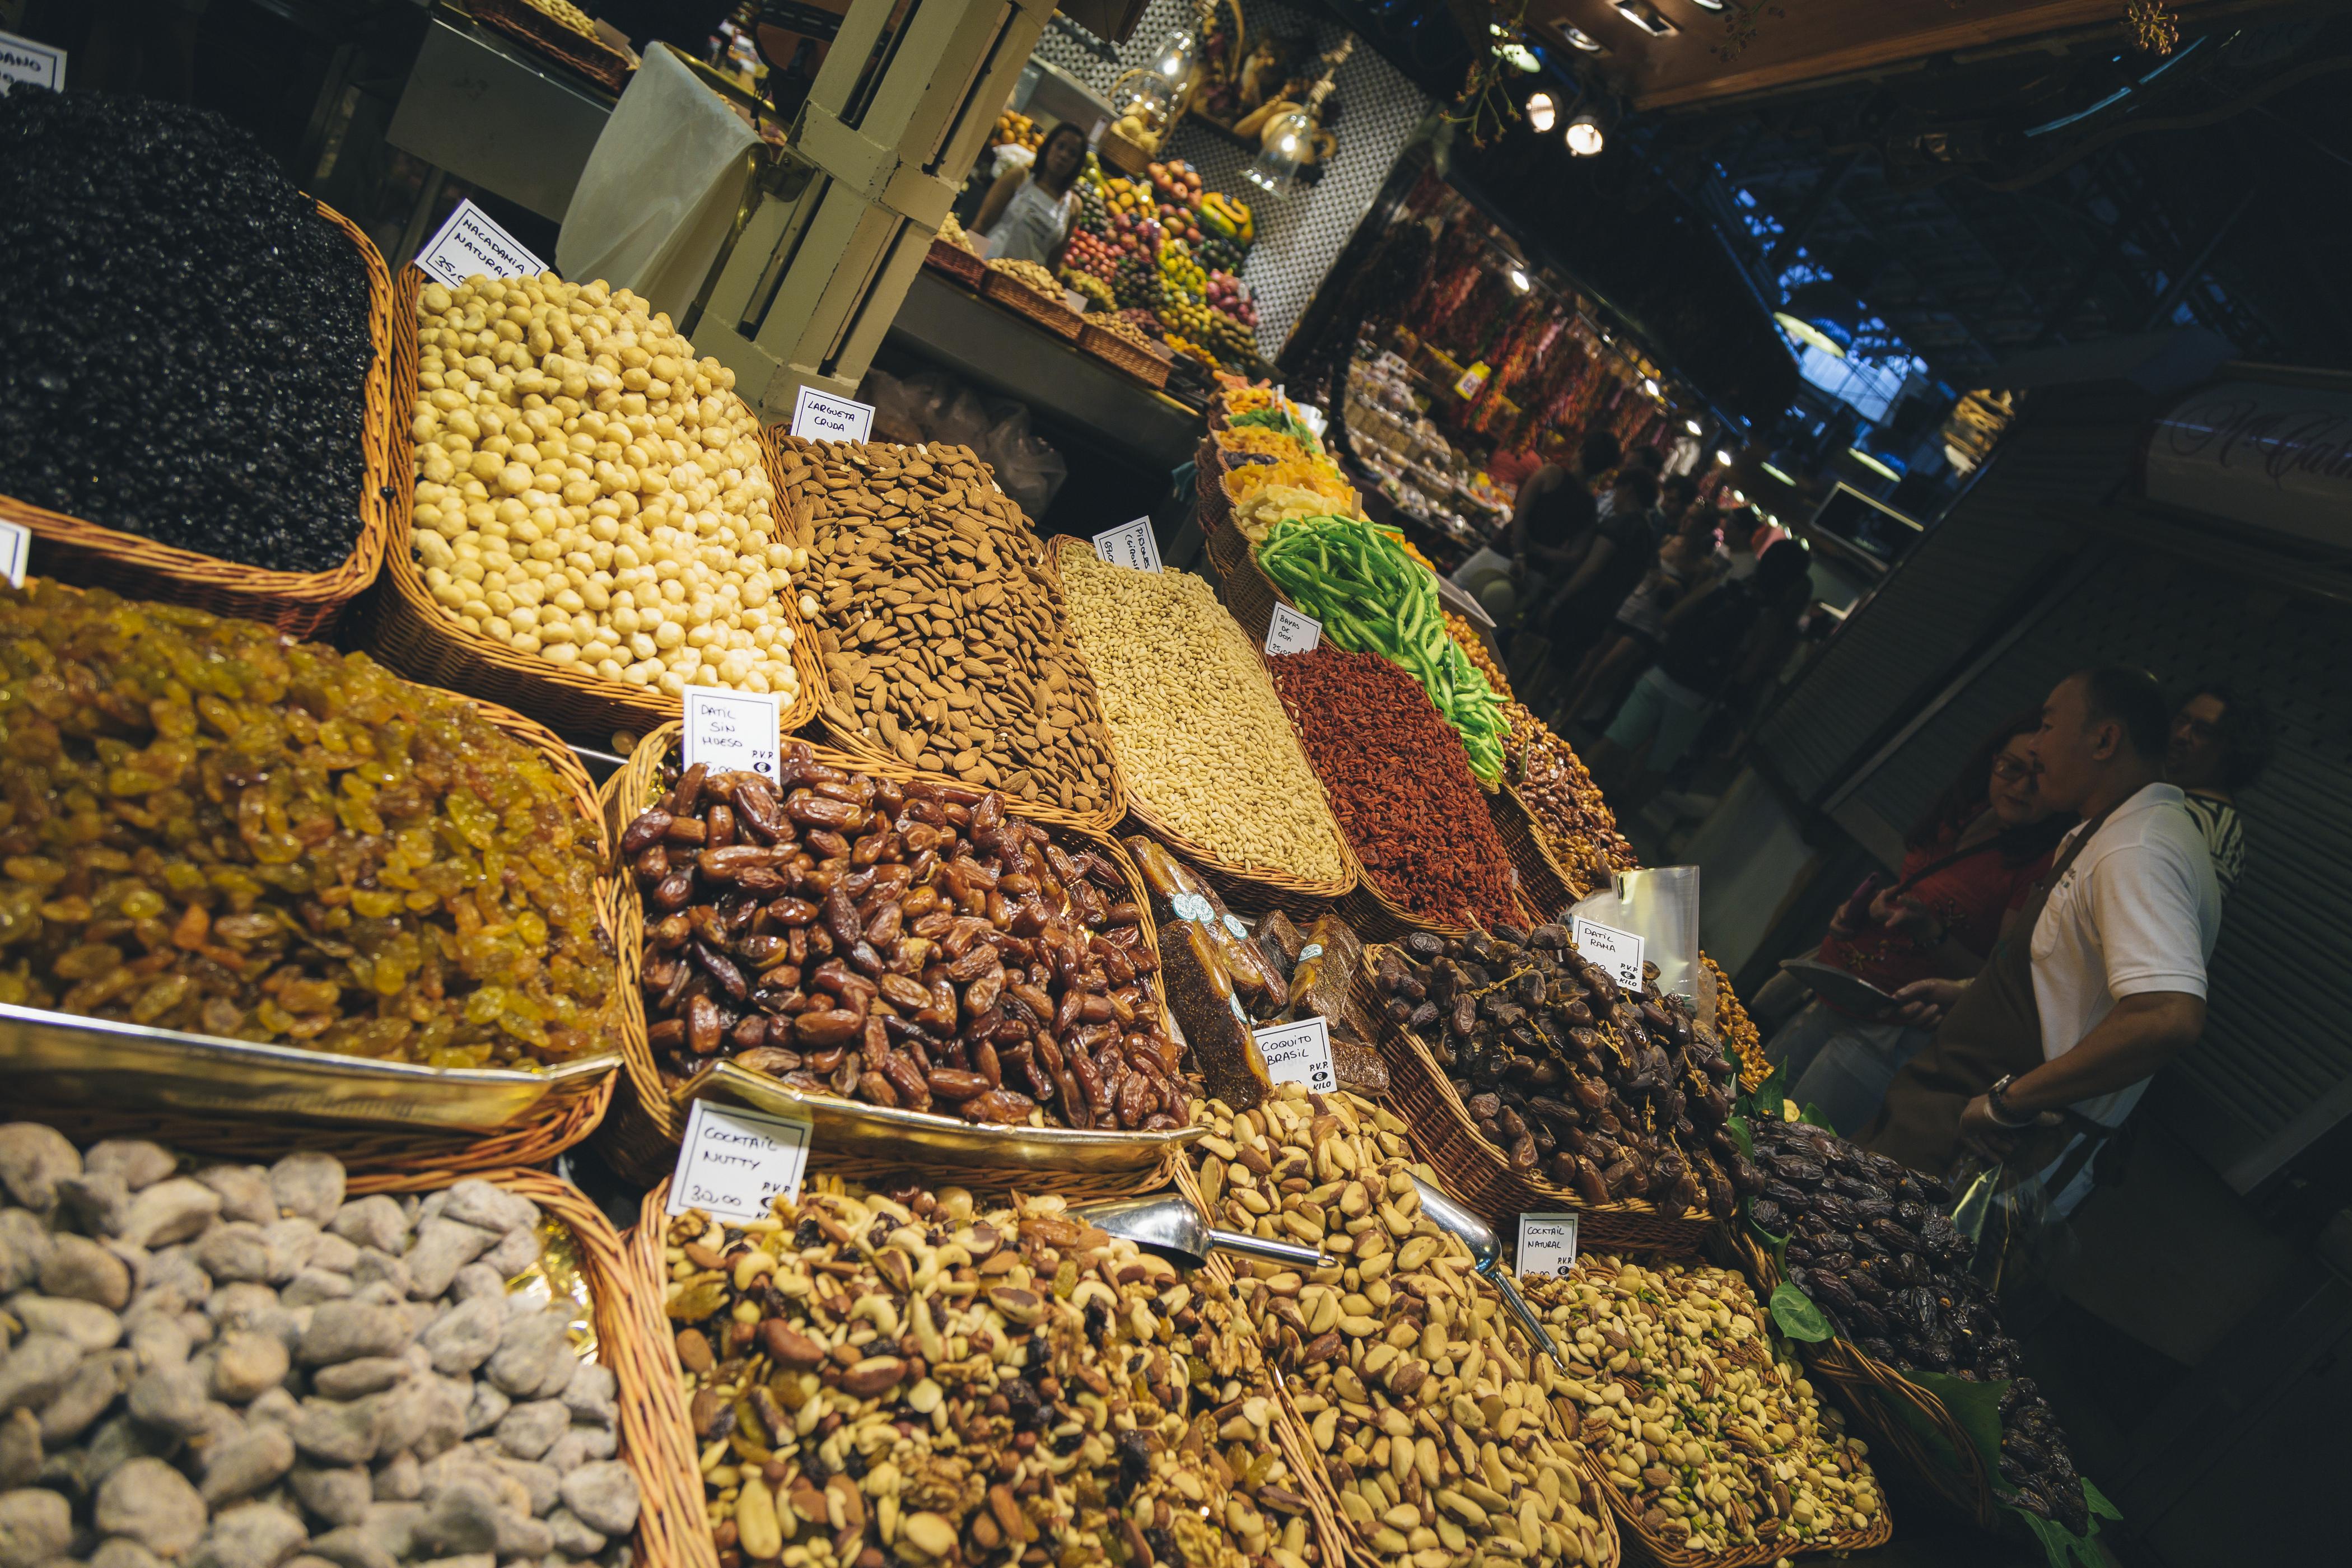 Barcelona, Spain - July 4, 2015: The historic Mercat de la Boqueria or Sant Josep Mercat (Boqueria market) in Barcelona, aside the Rambla. People and tourists walking in the building.